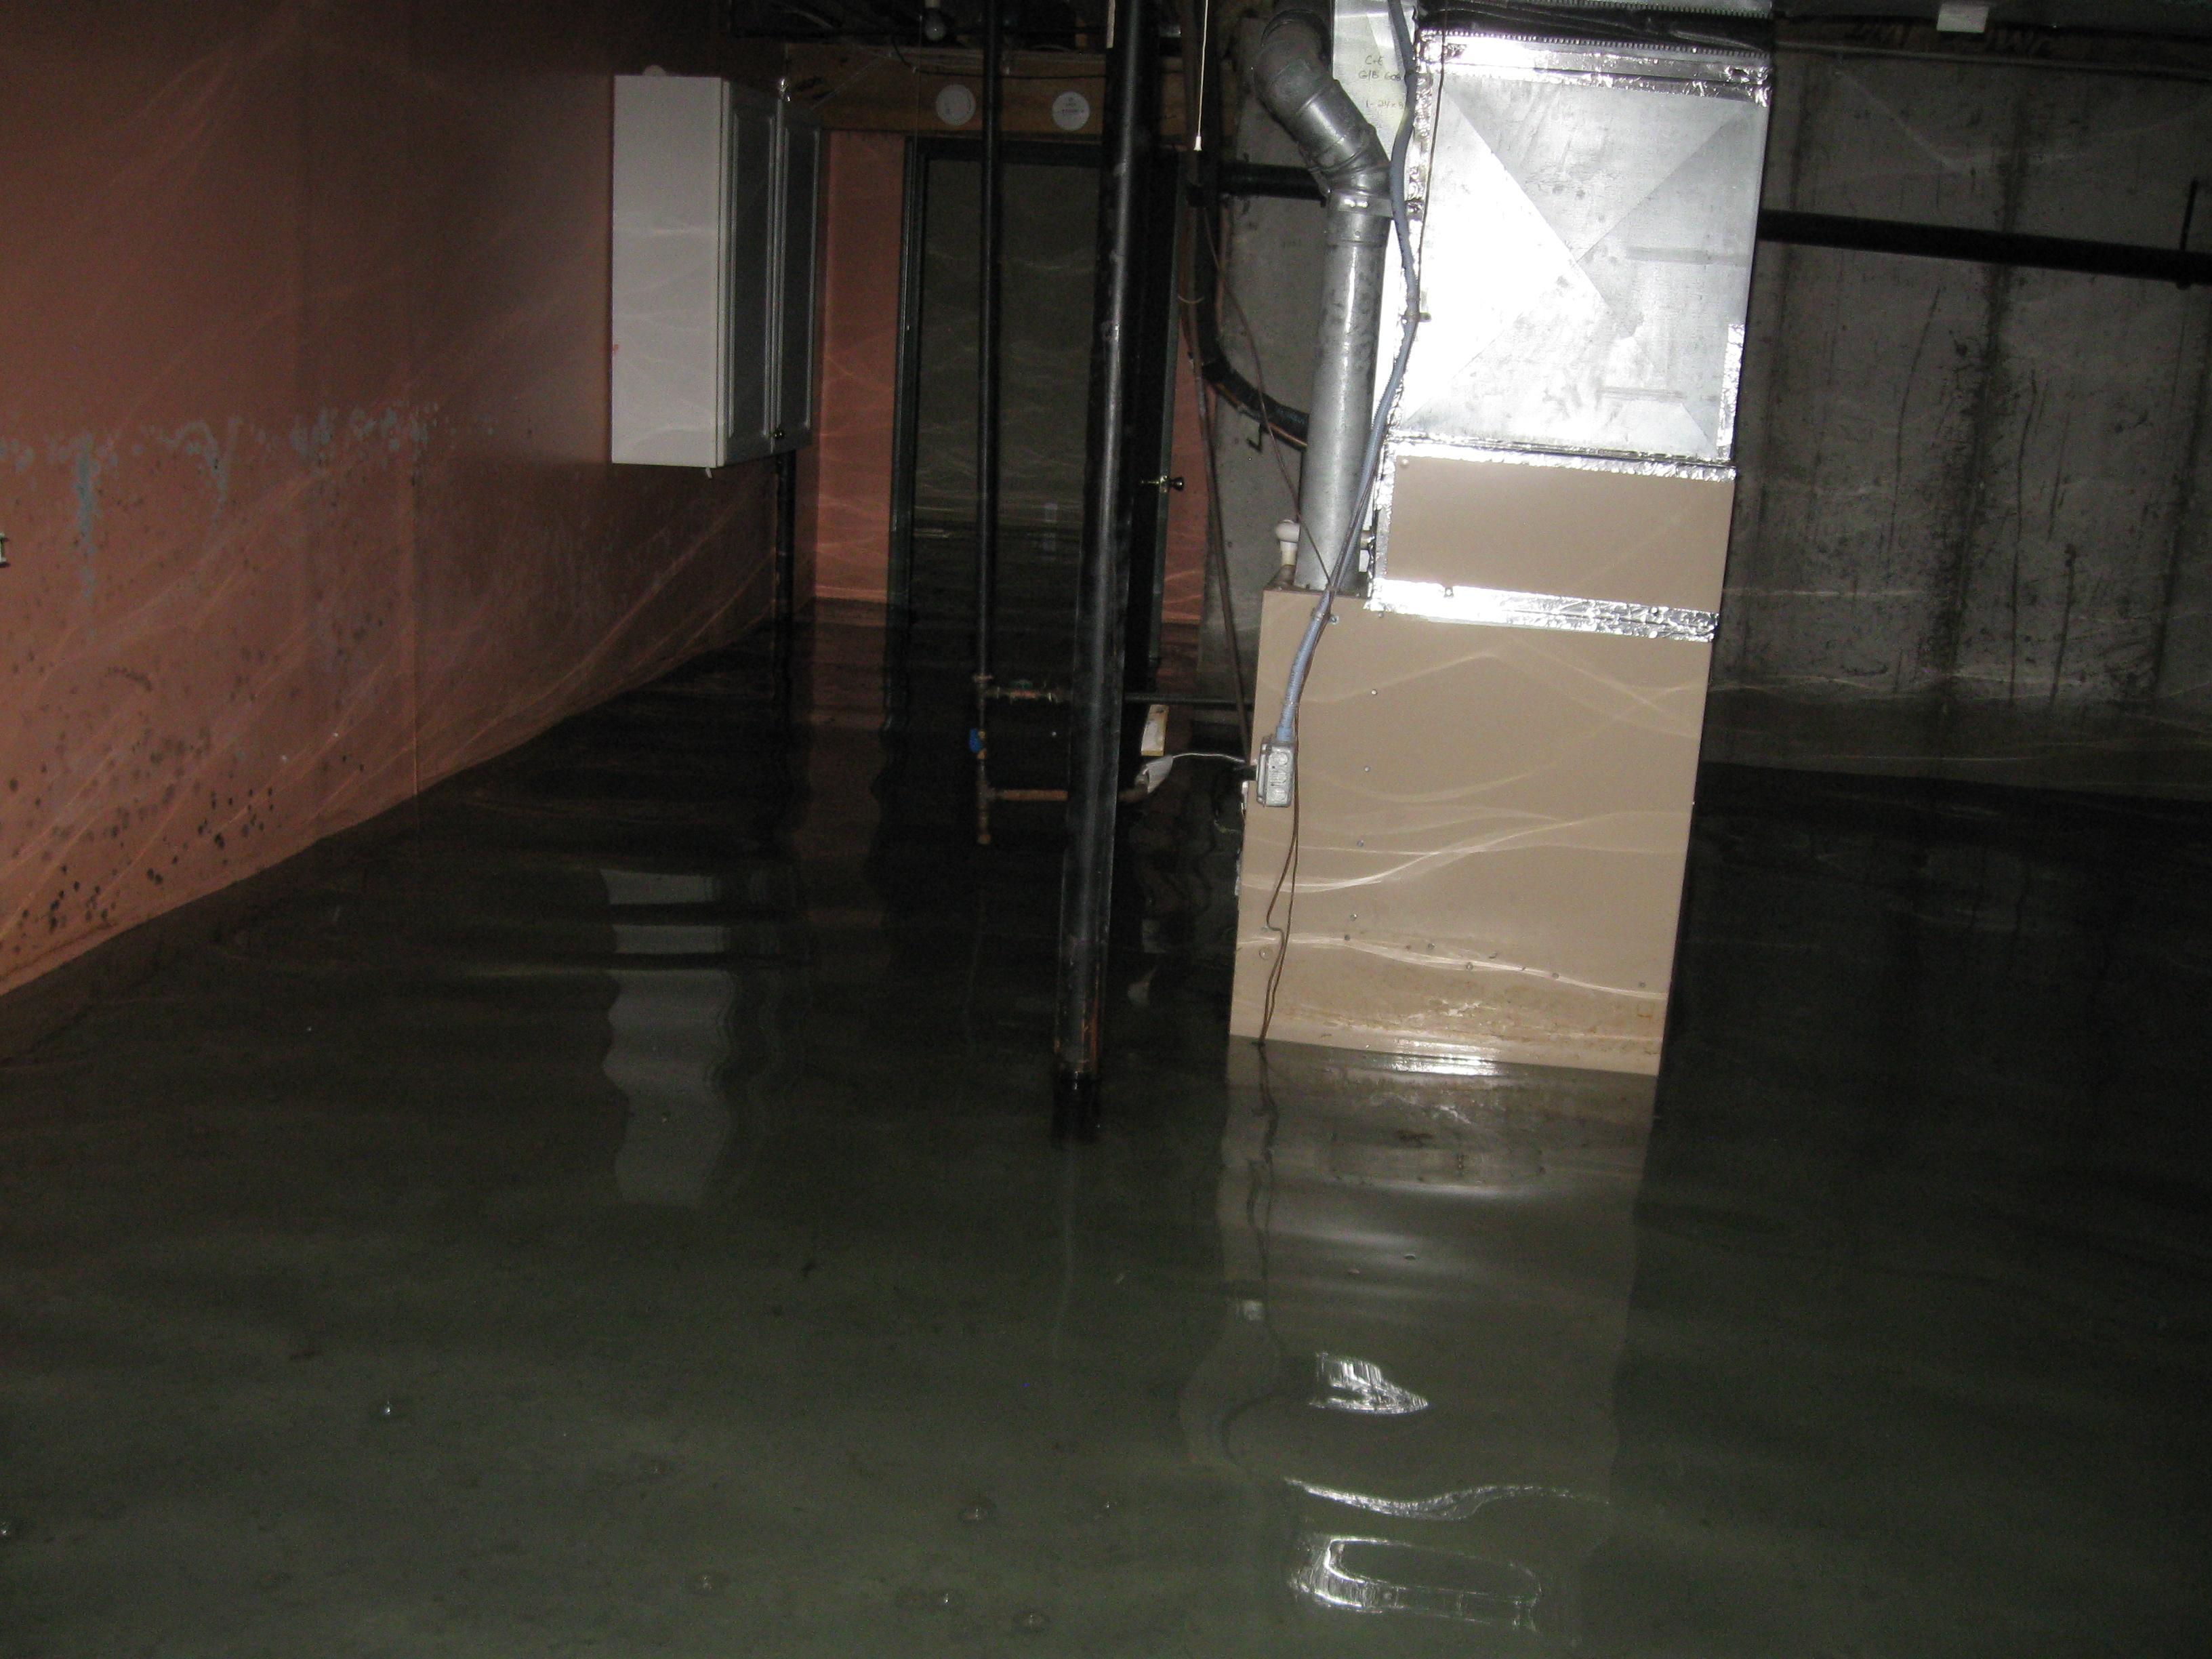 Clayton New Jersey flood damage